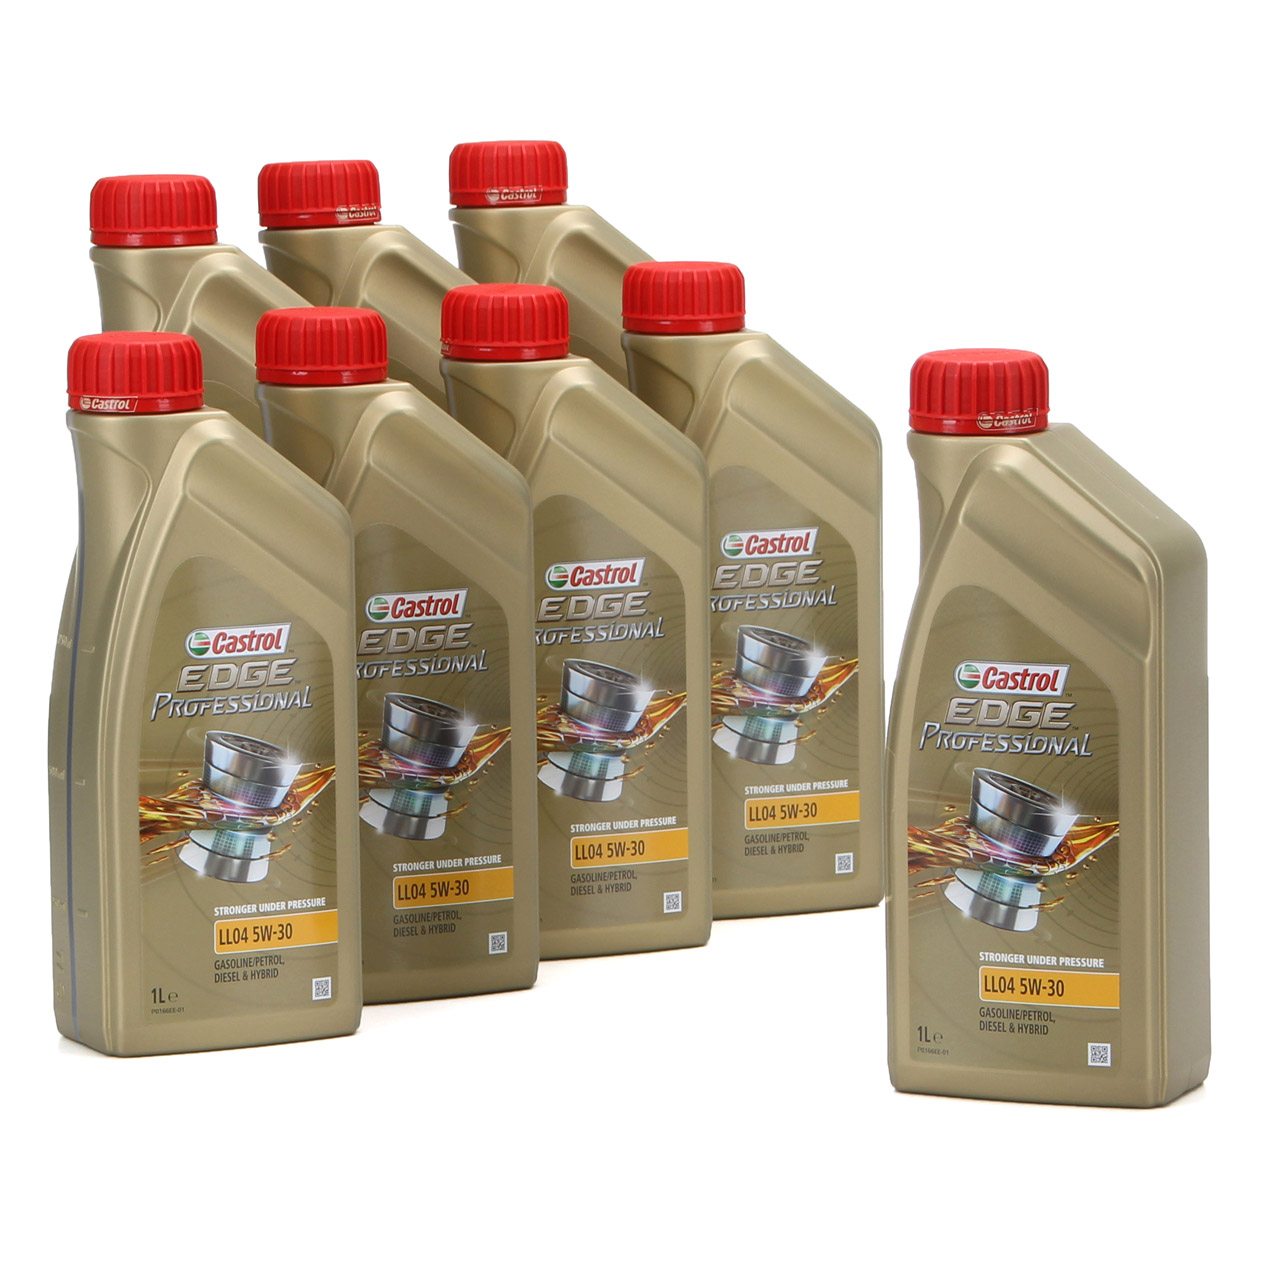 CASTROL EDGE Professional Motoröl Öl für BMW Longlife IV LL04 5W-30 - 8 Liter